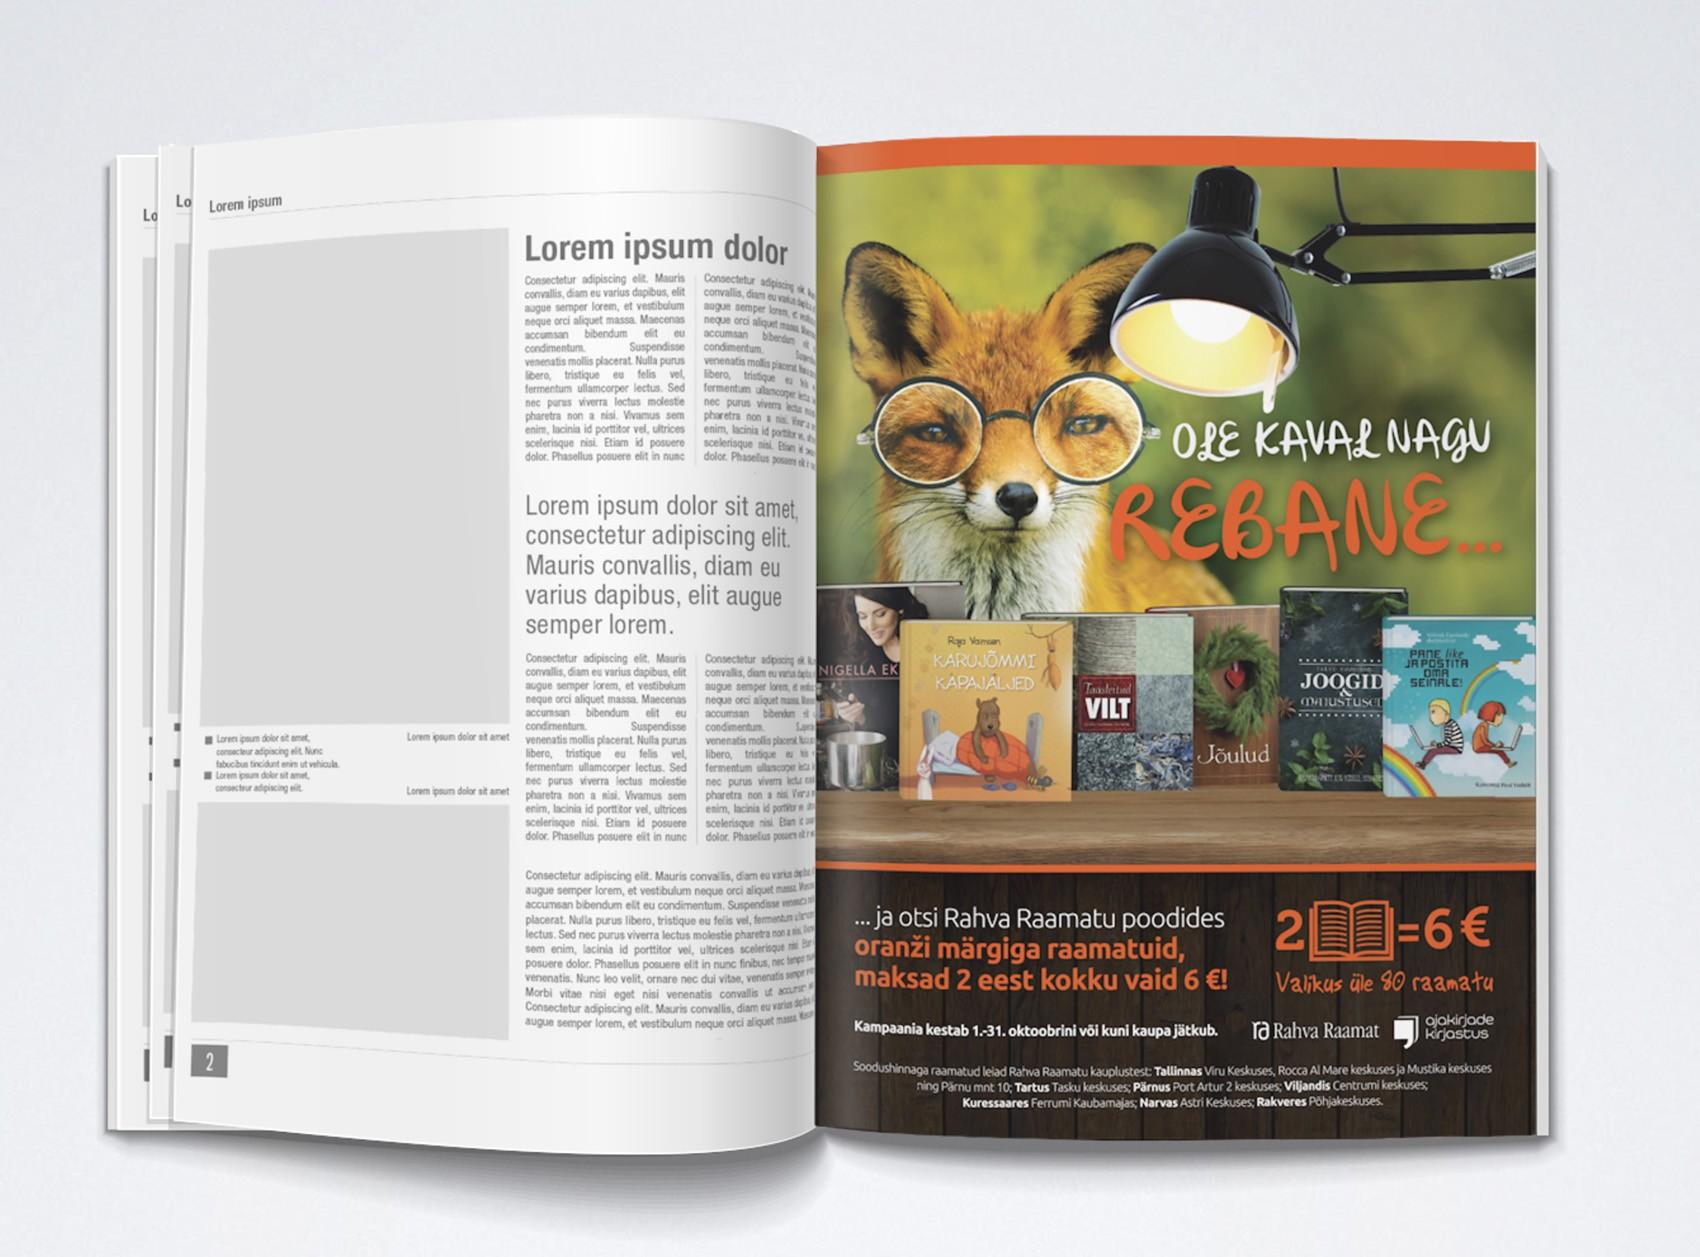 Reklaam ajakirjas